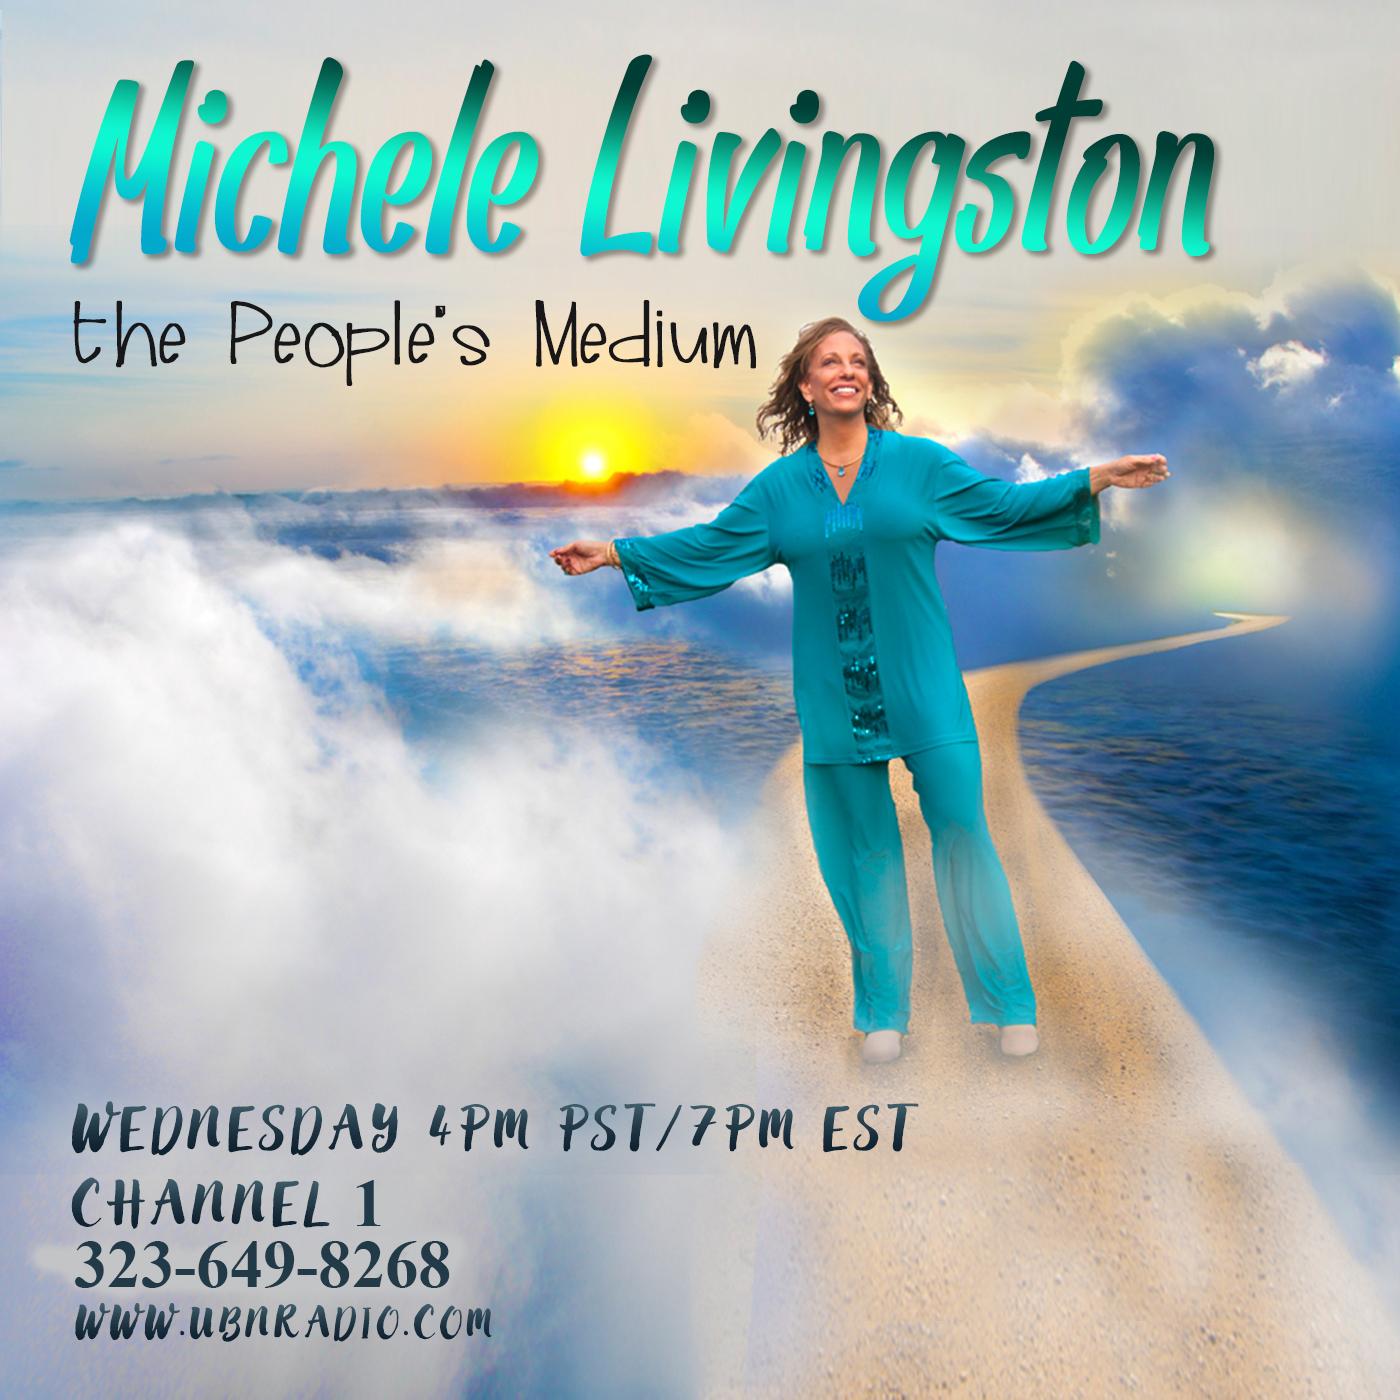 Michele Livingston The People's Medium